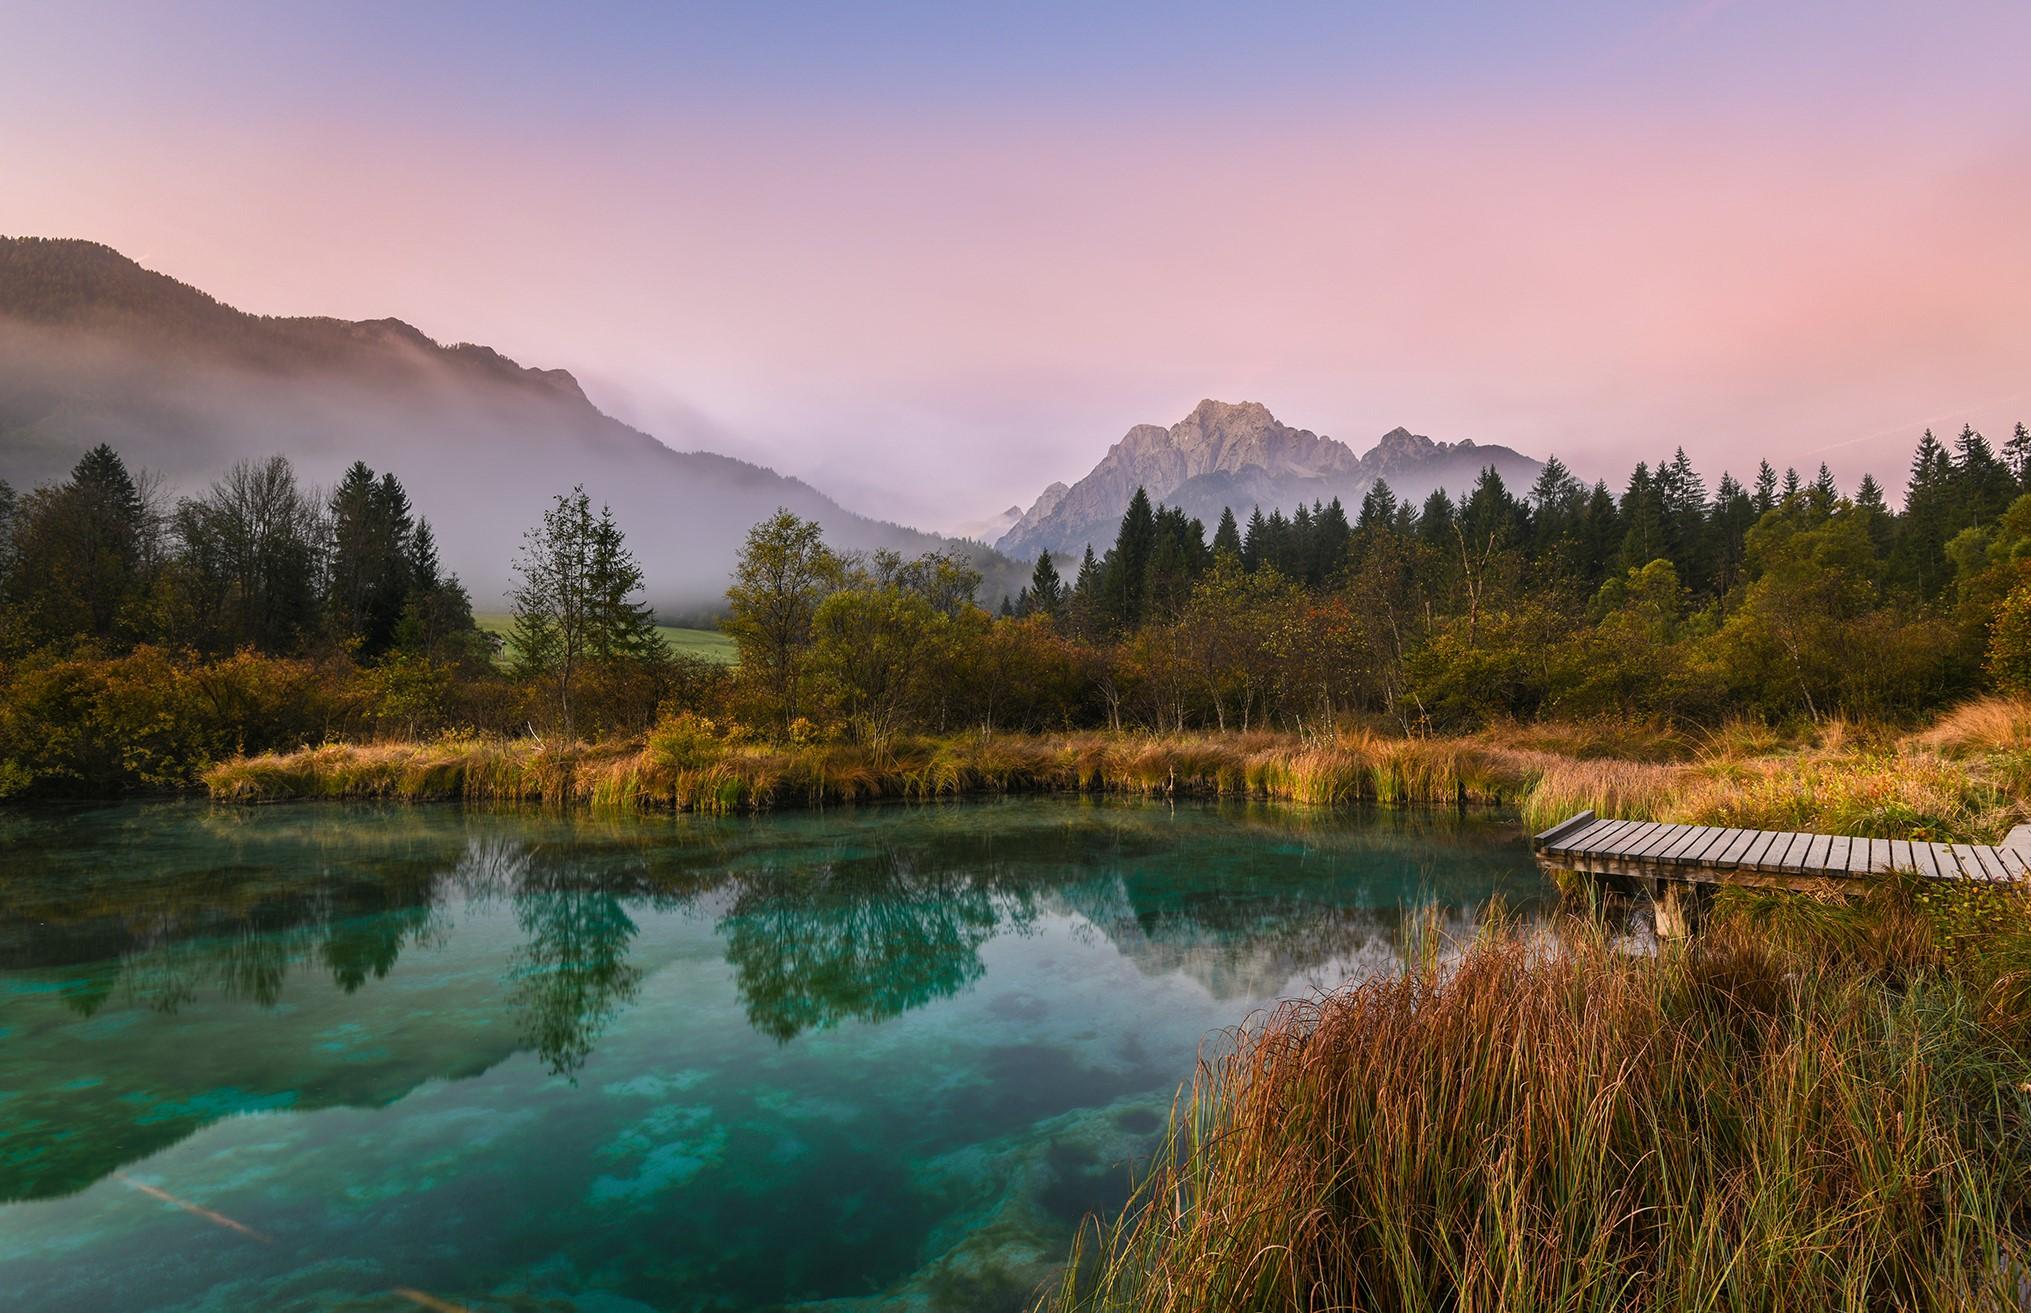 Zelenci Nature Reserve at sunrise, Slovenia